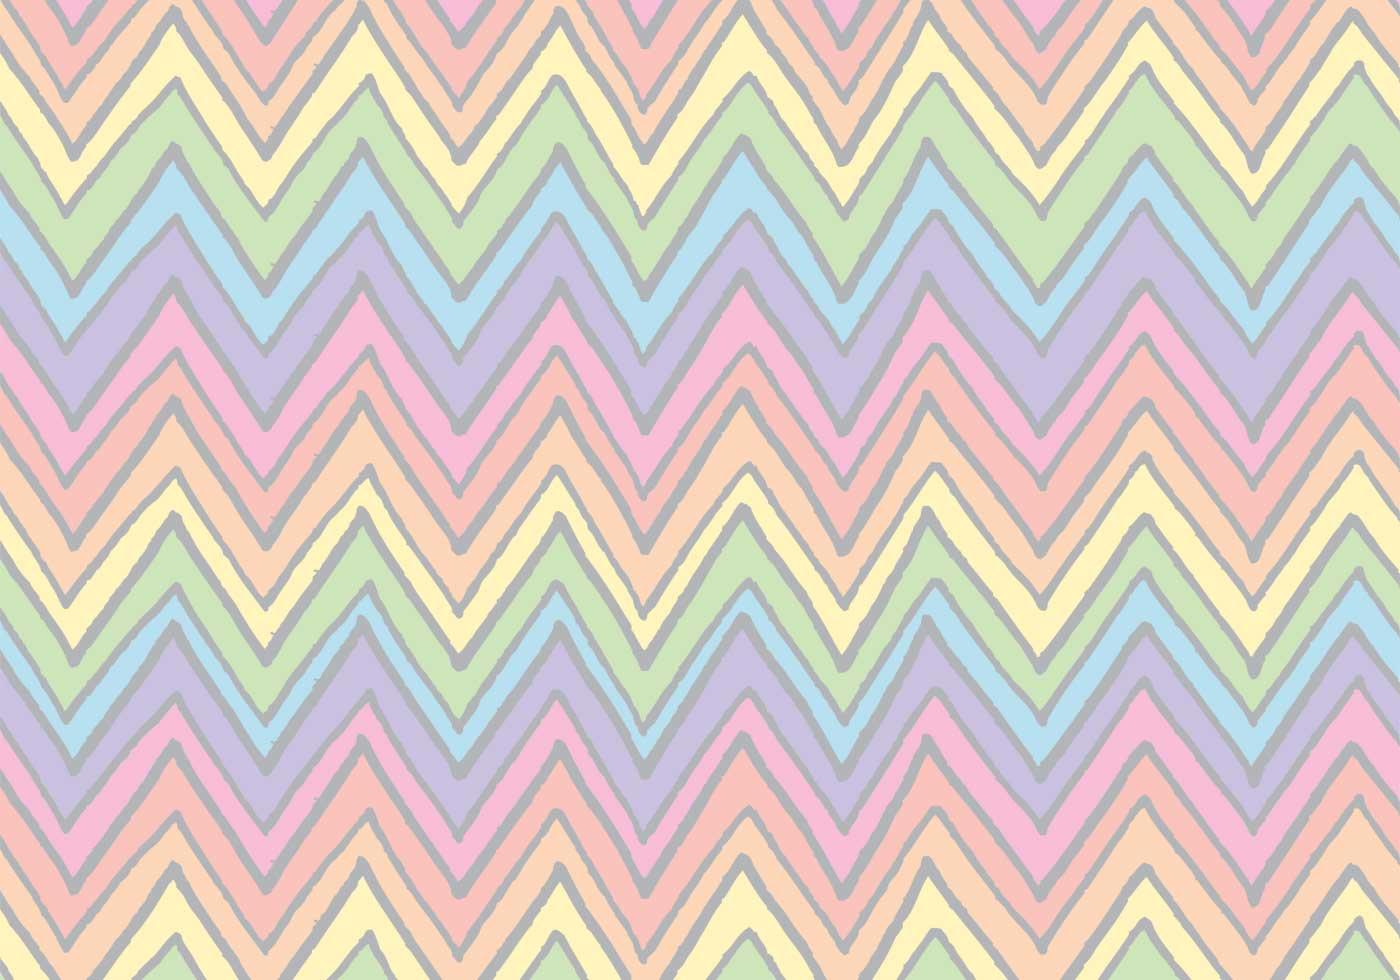 Cute Kid Wallpapers Free Download Rainbow Chevron Patterns Www Imgkid Com The Image Kid